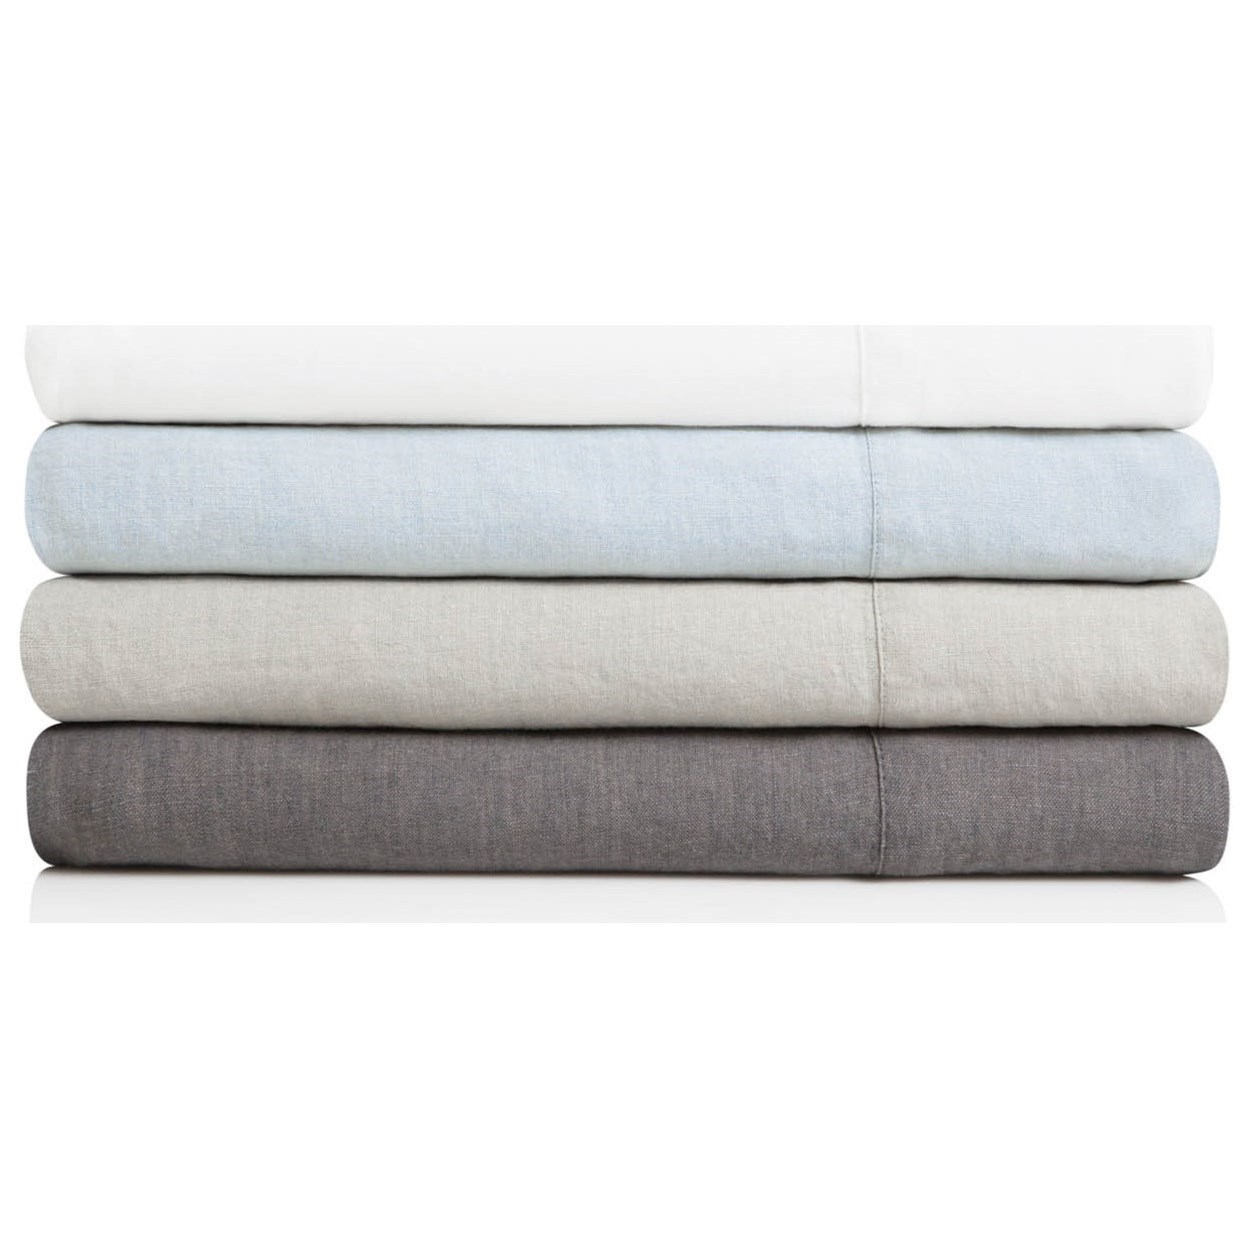 French Linen King Pillowcases by Malouf at SlumberWorld